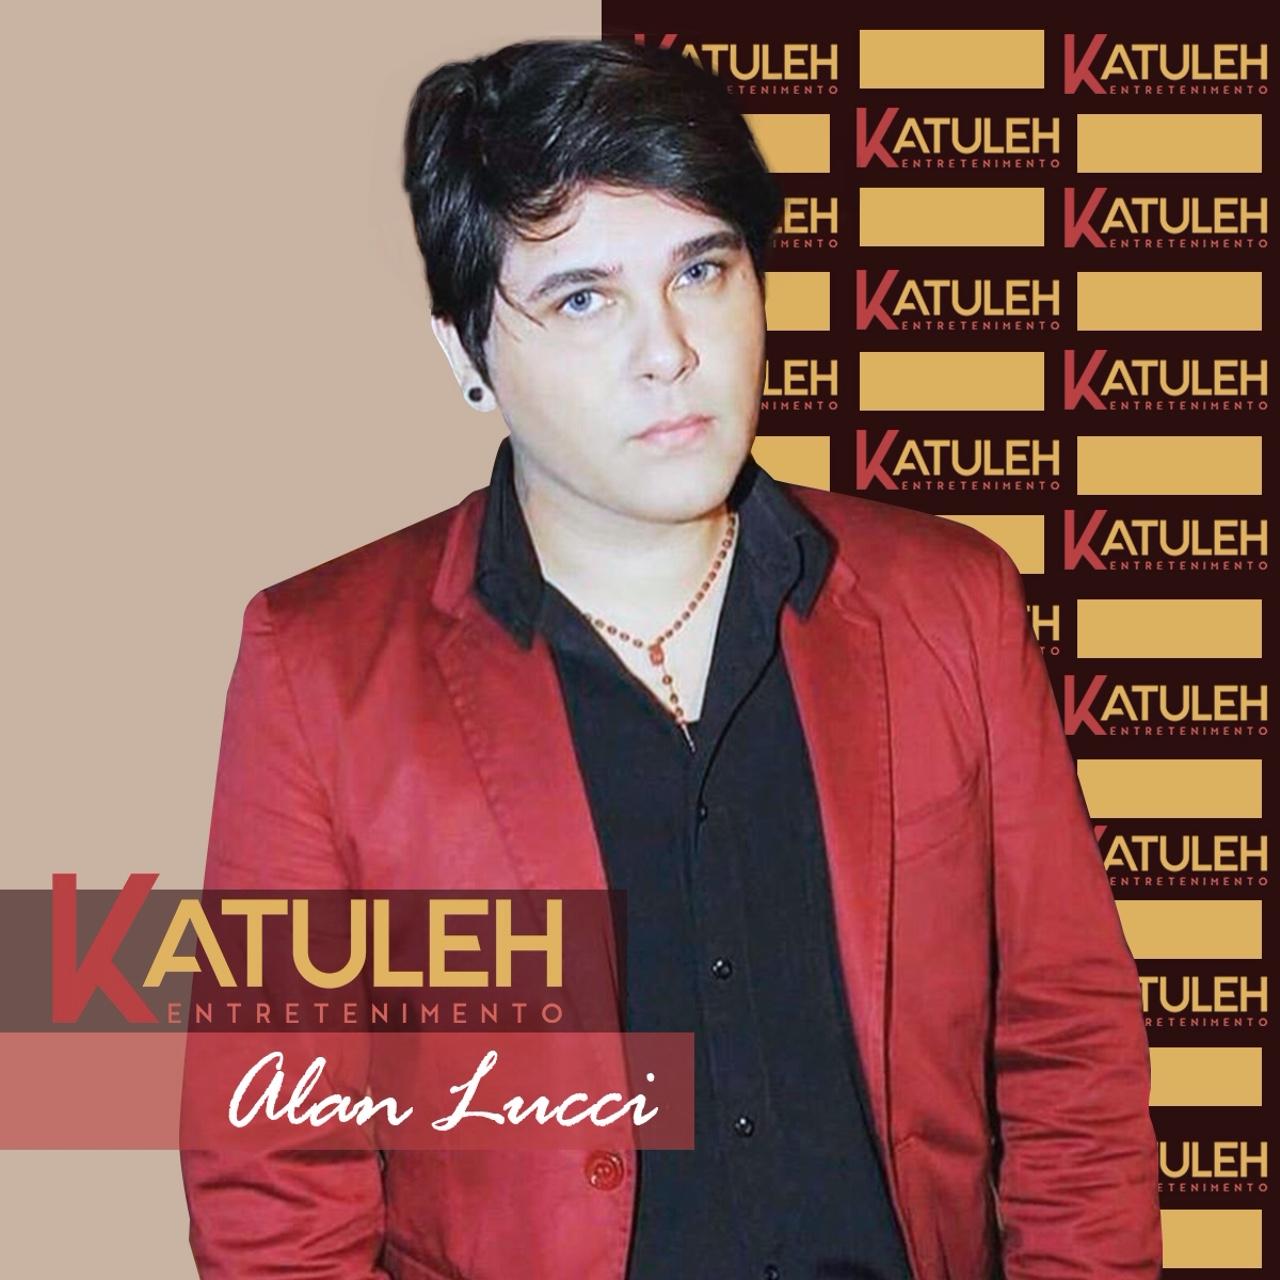 Alan Lucci